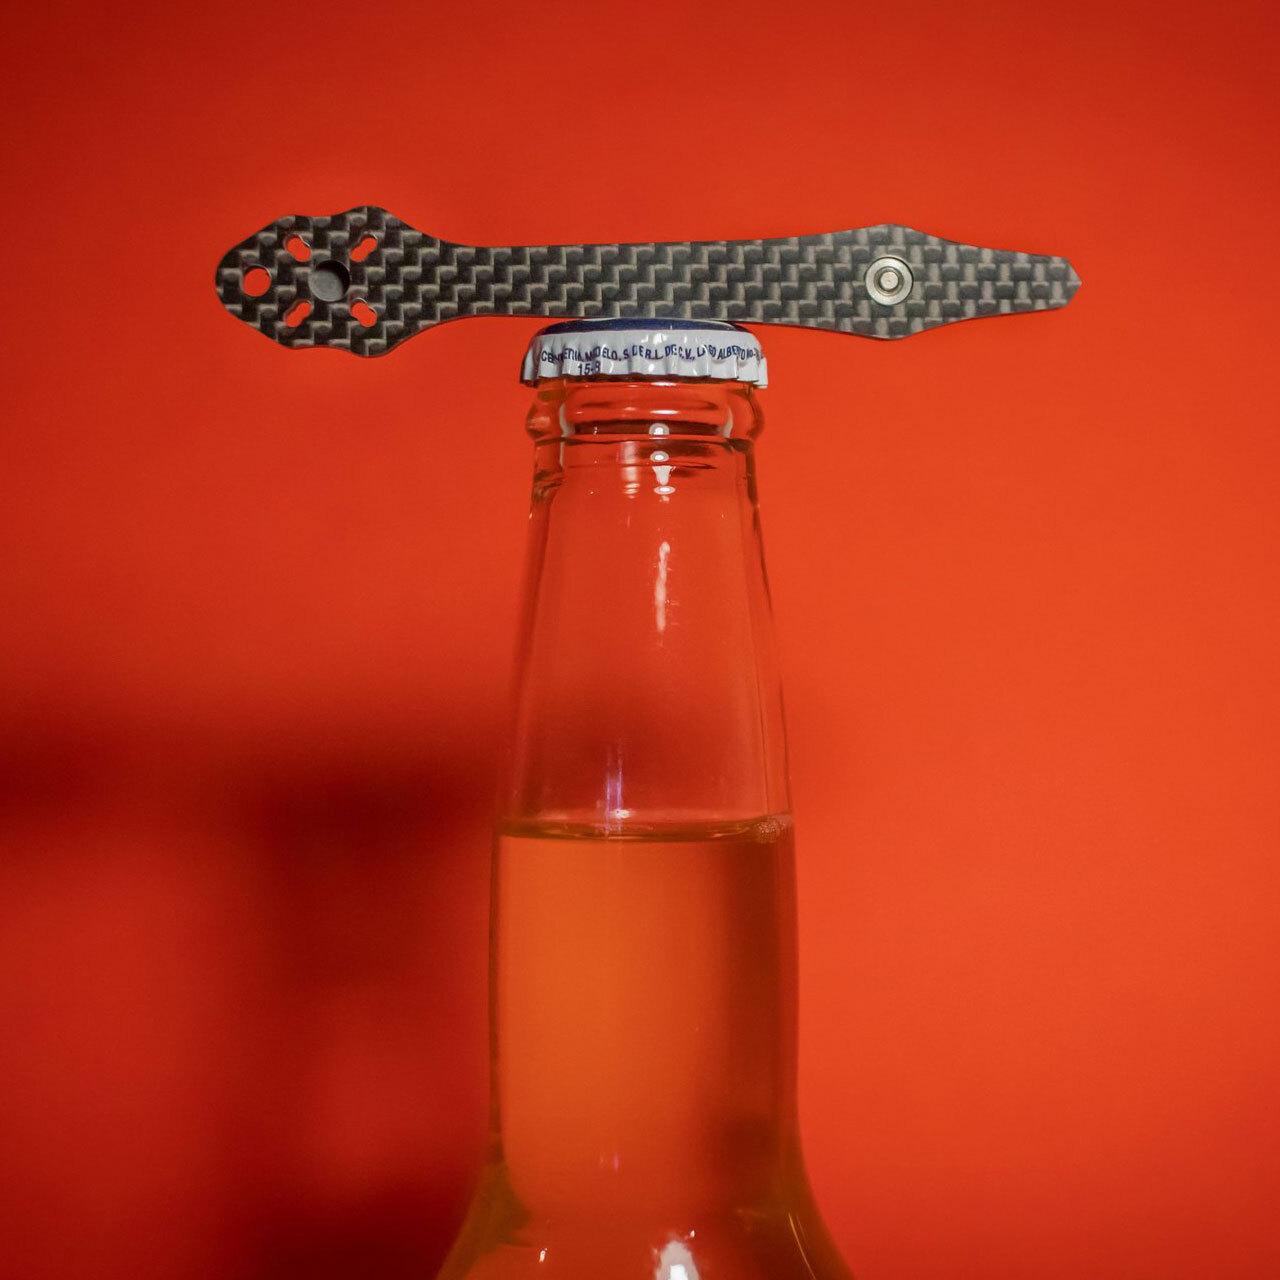 ImpulseRC MICRO APEX BOTTLE OPENER ARM